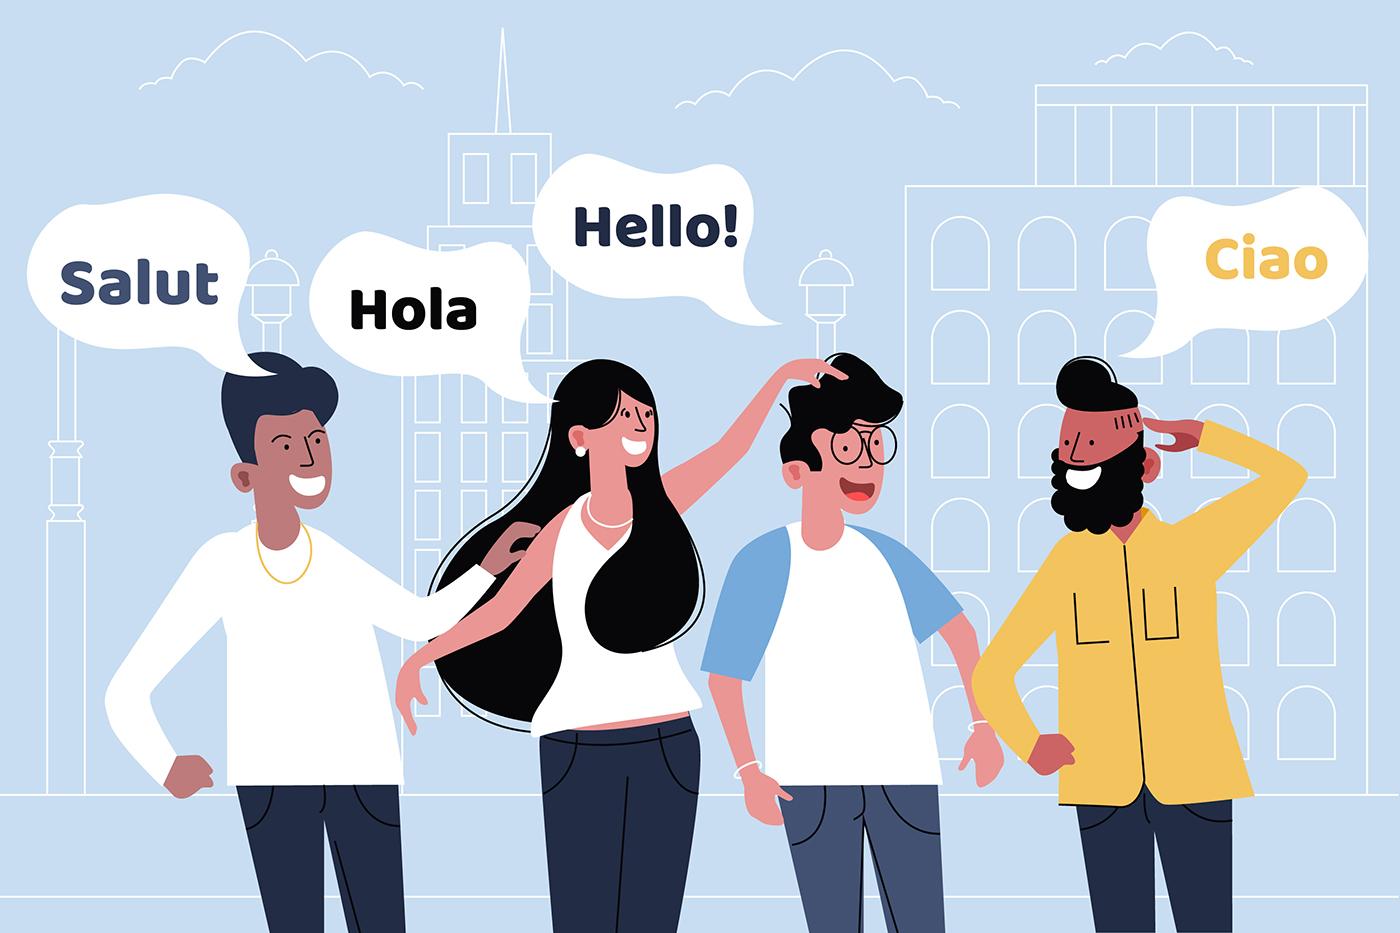 OctaFX Multilingual Support